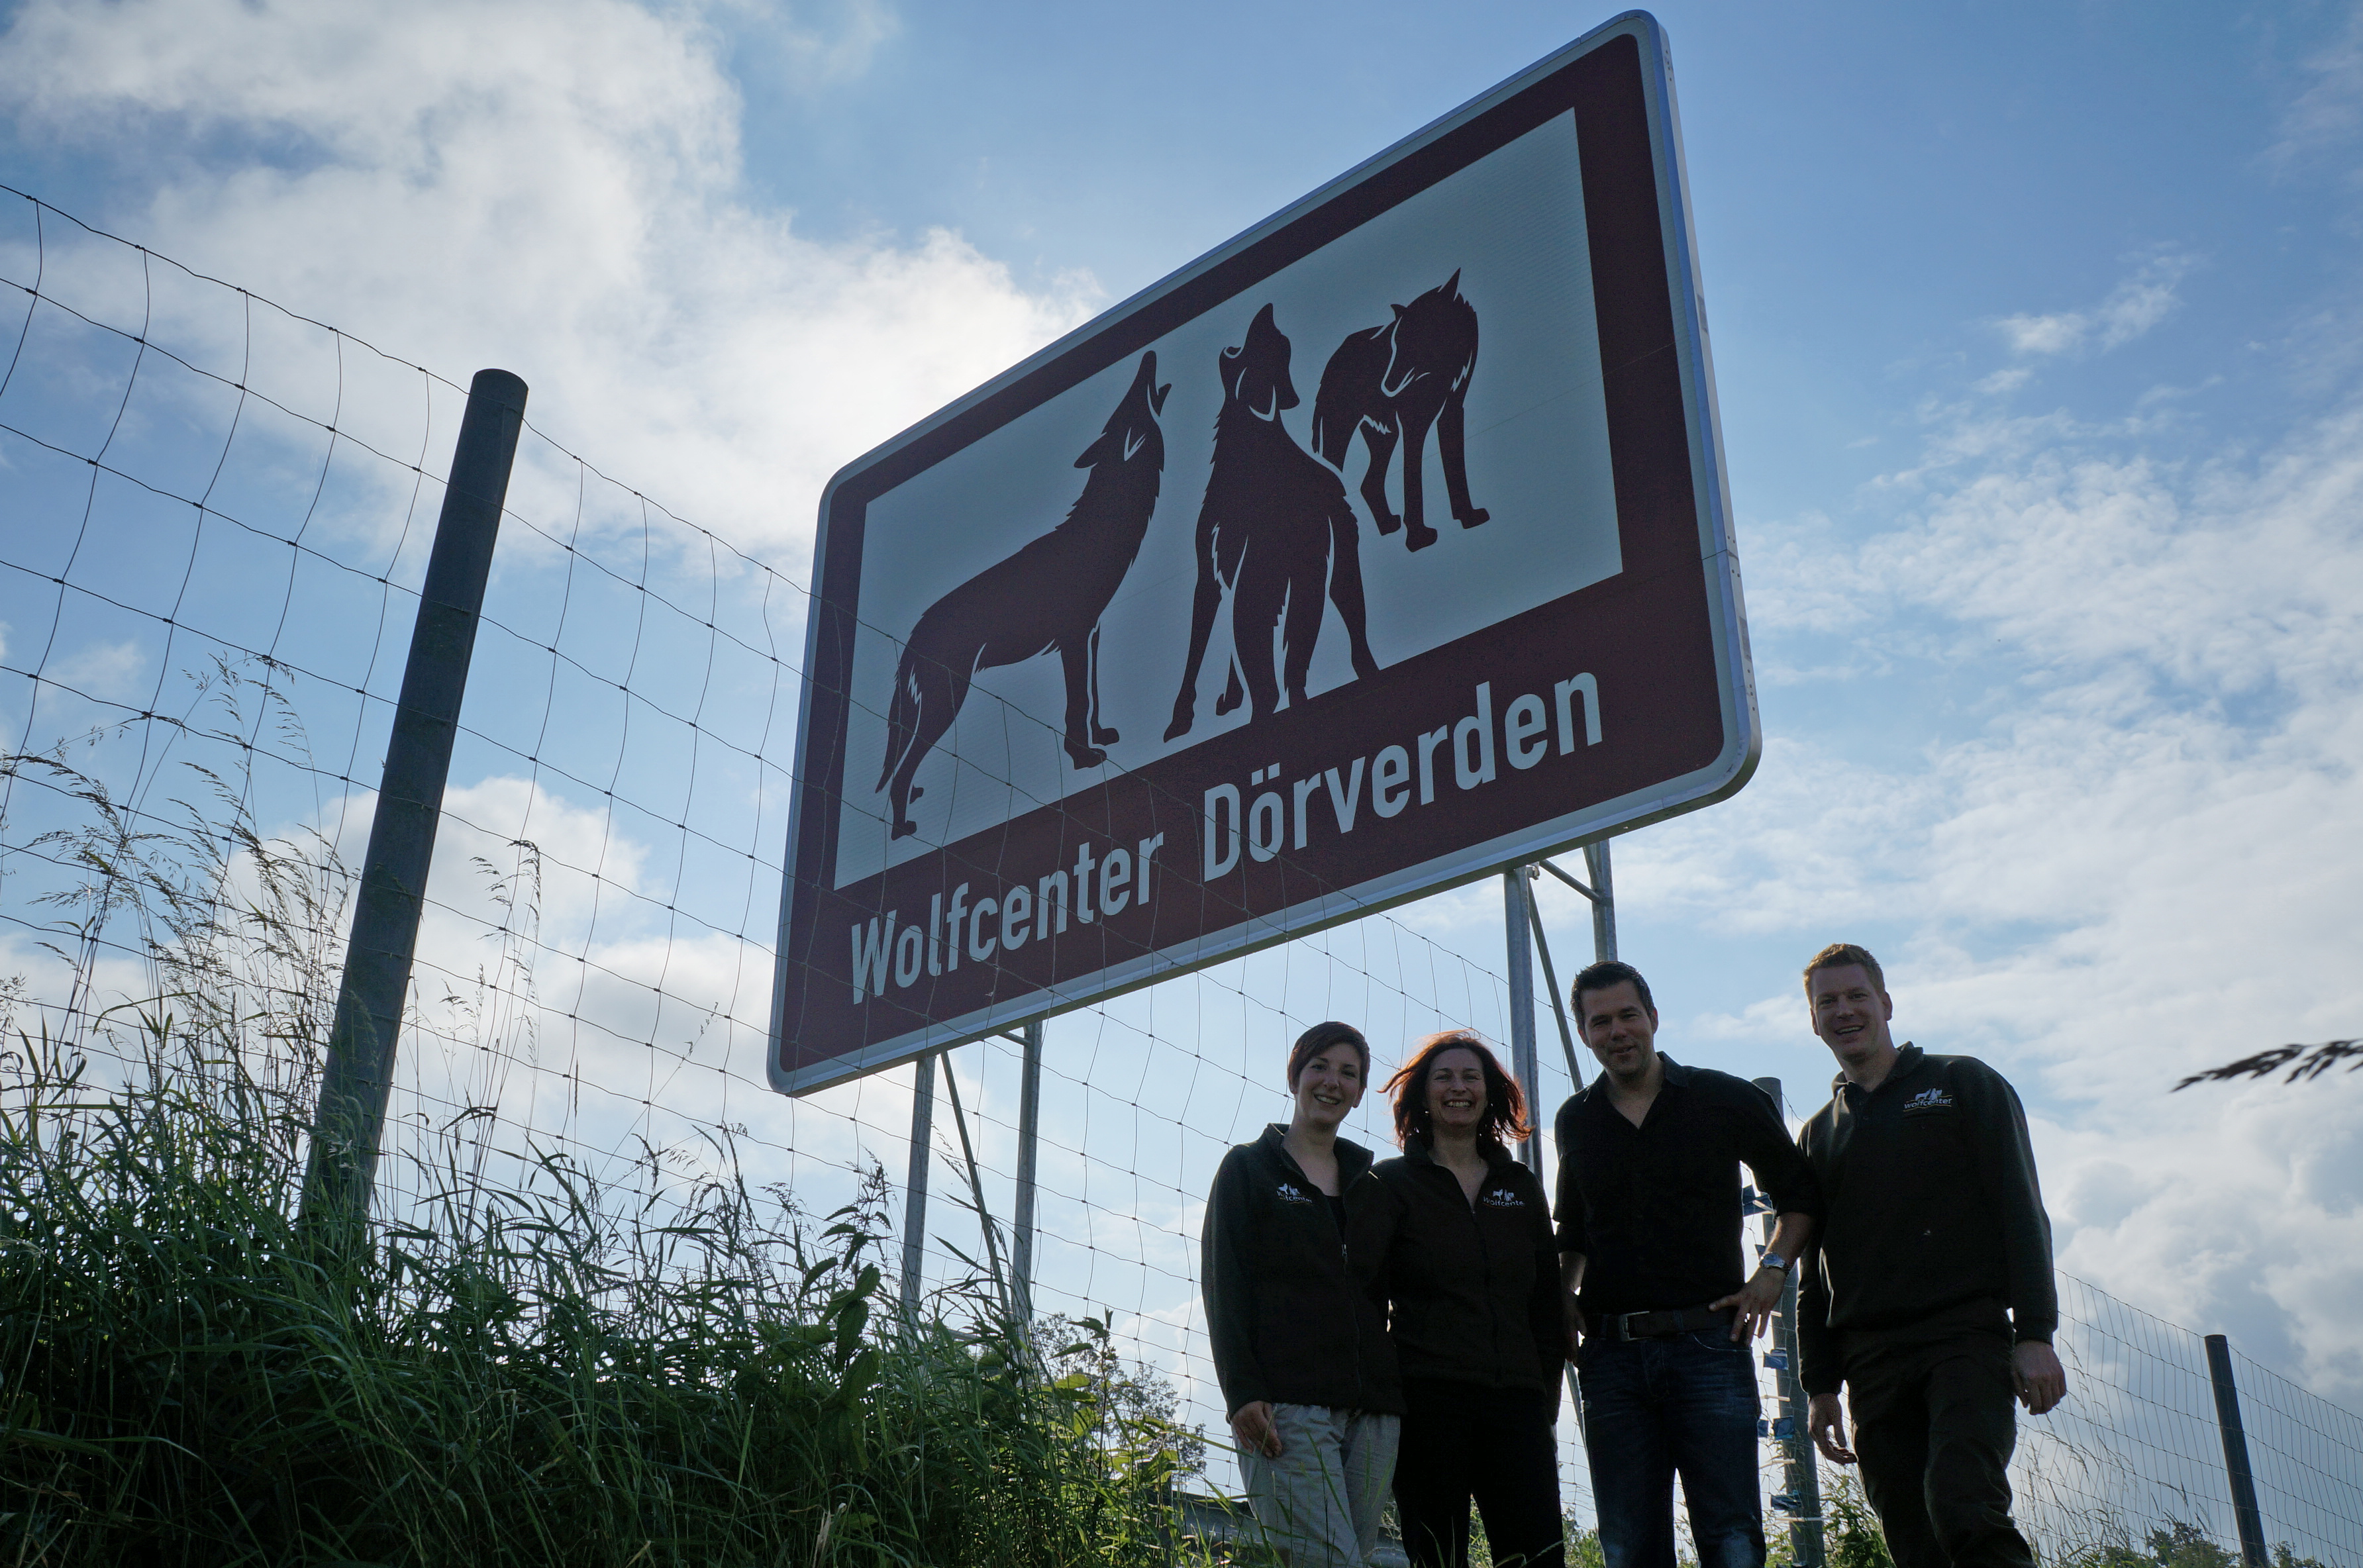 Wolfcenter, Frank Faß, Christina Faß, Autobahnschild, B27, Tourismus